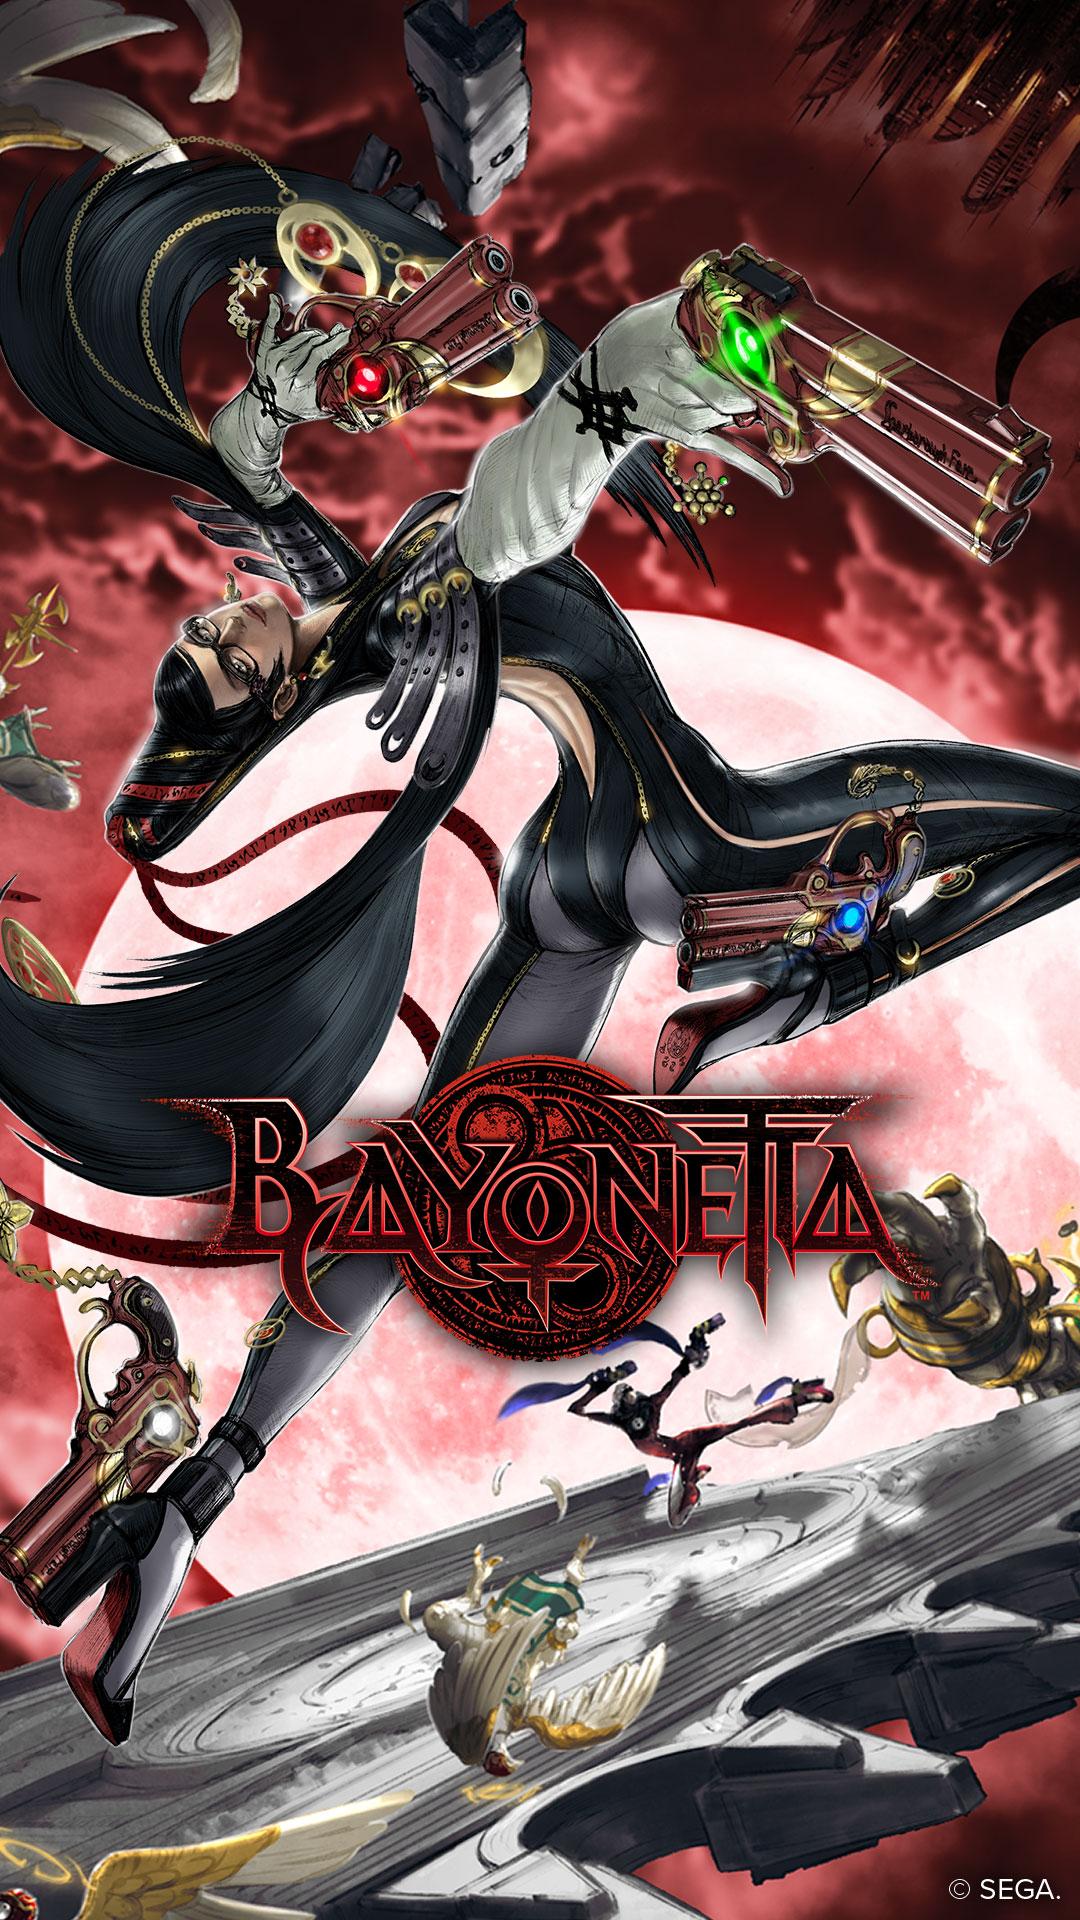 Bayonetta_1080x1920.jpg